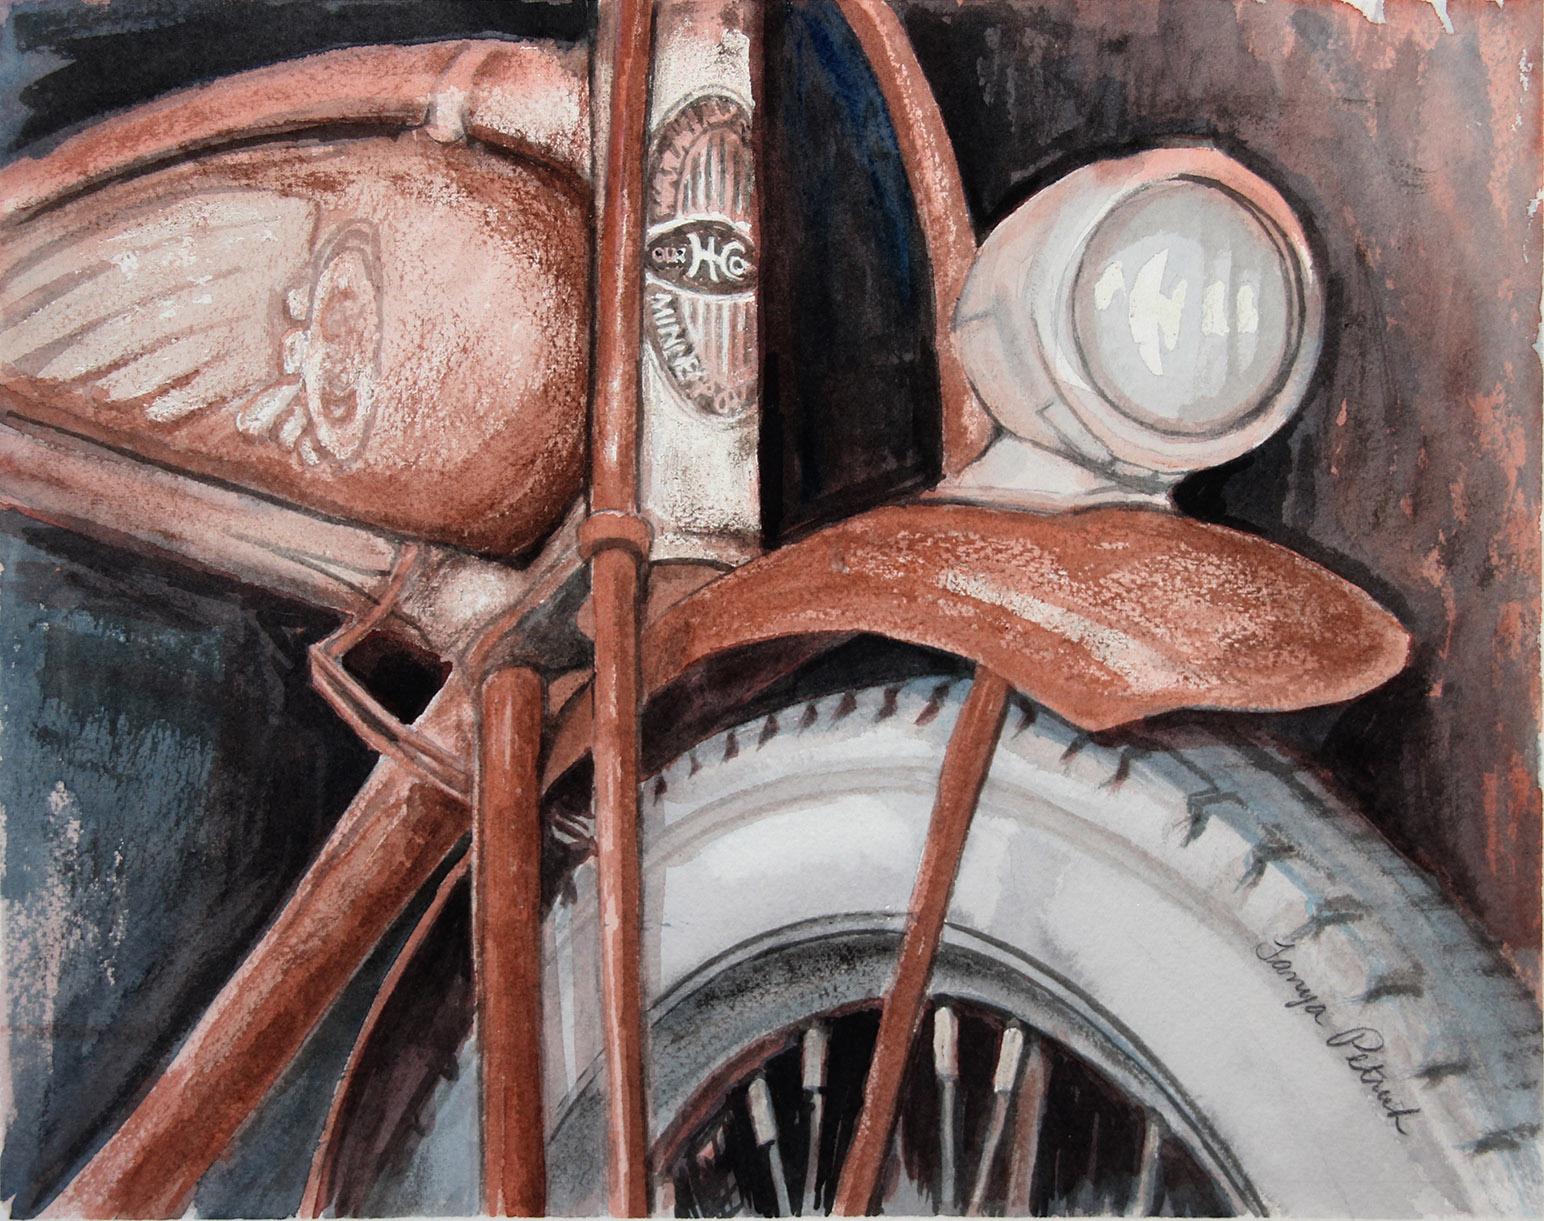 Rusty '38 sports art